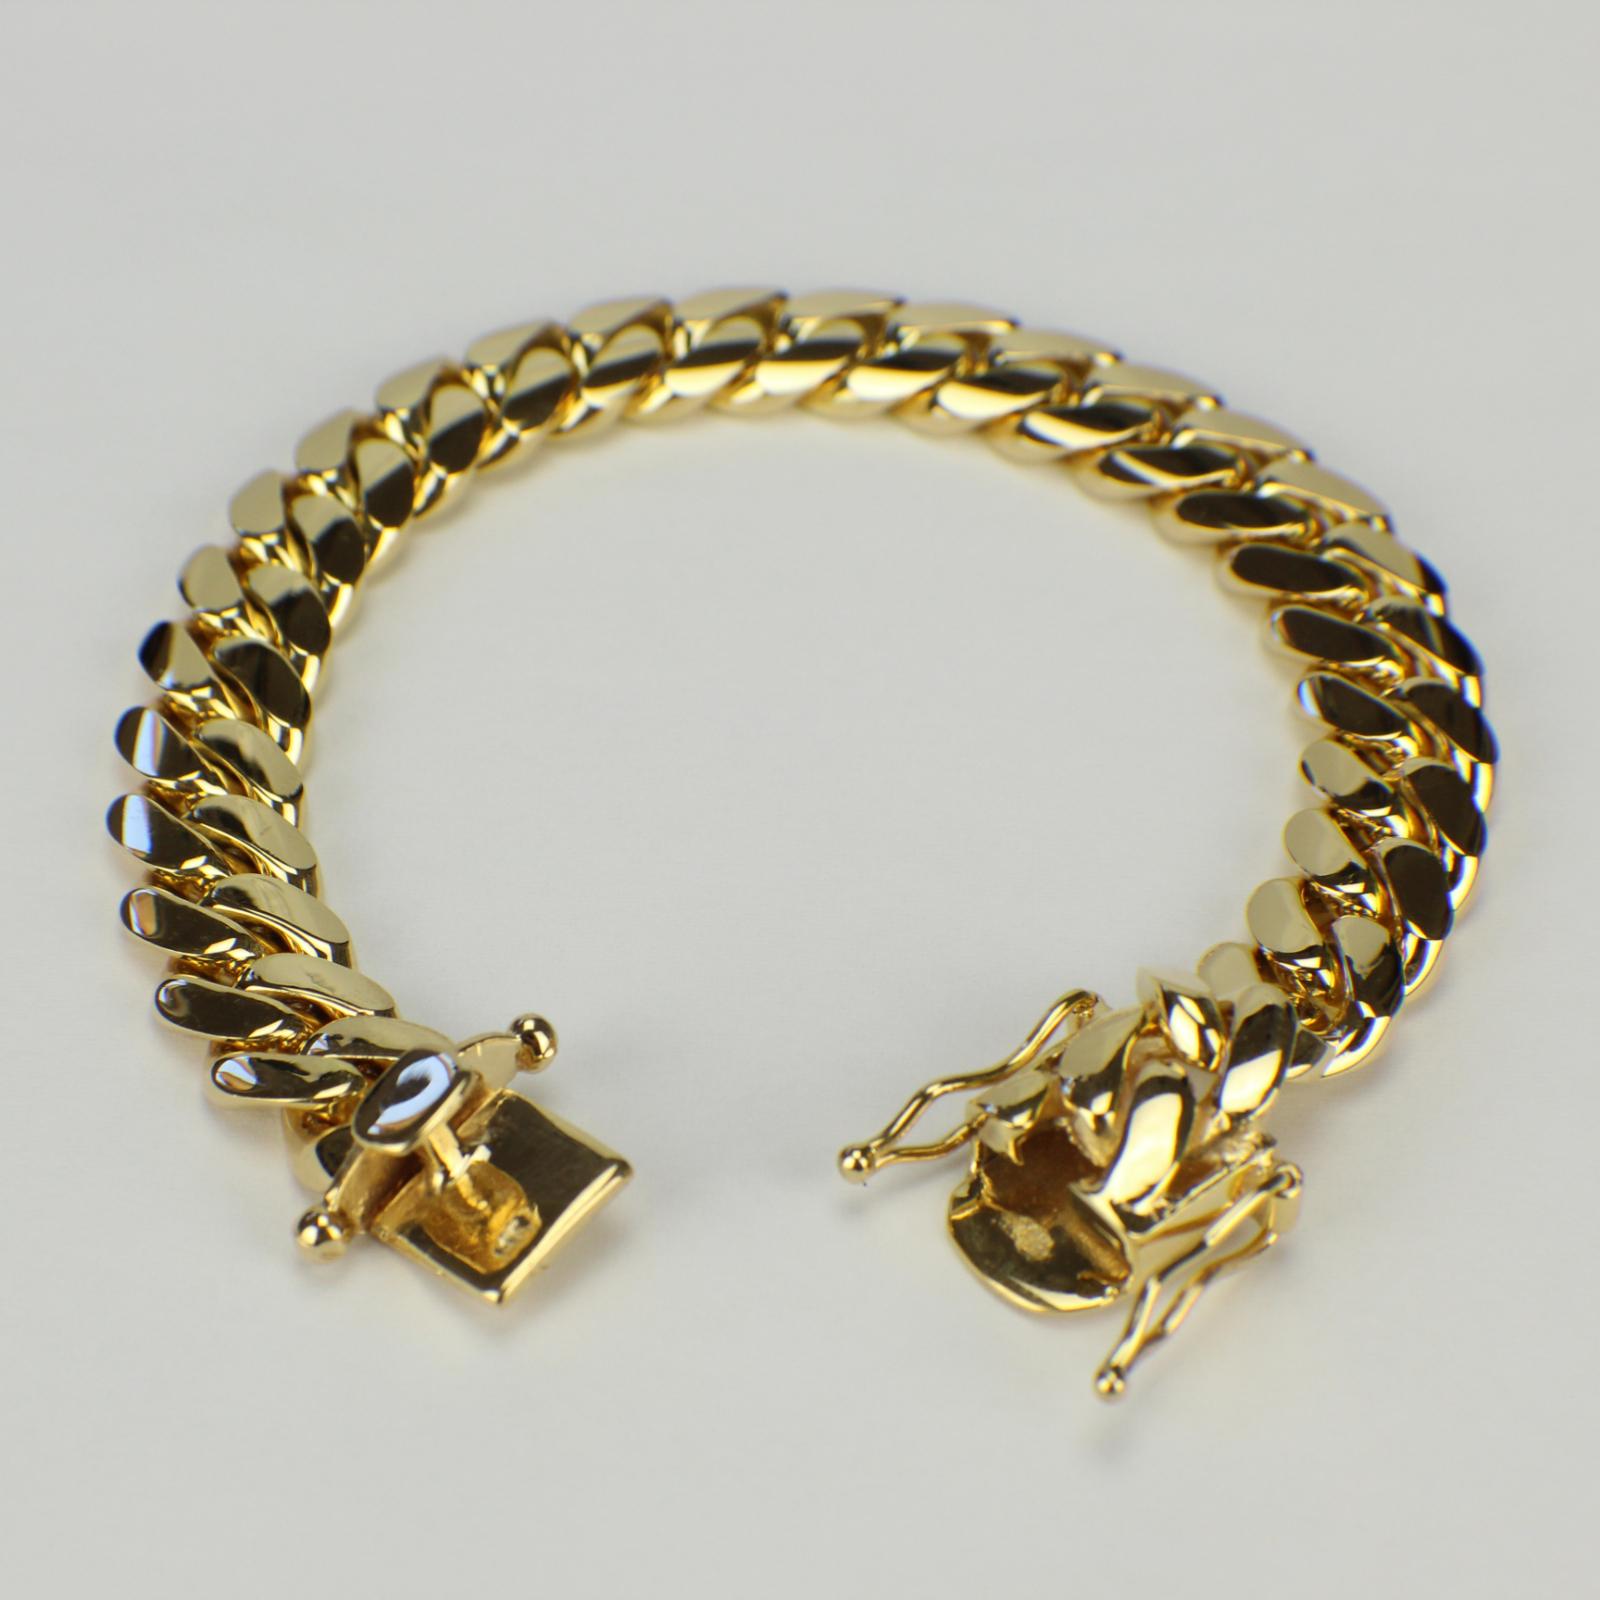 c4f8788aebd9a 14K 12mm Miami Cuban Link Bracelet